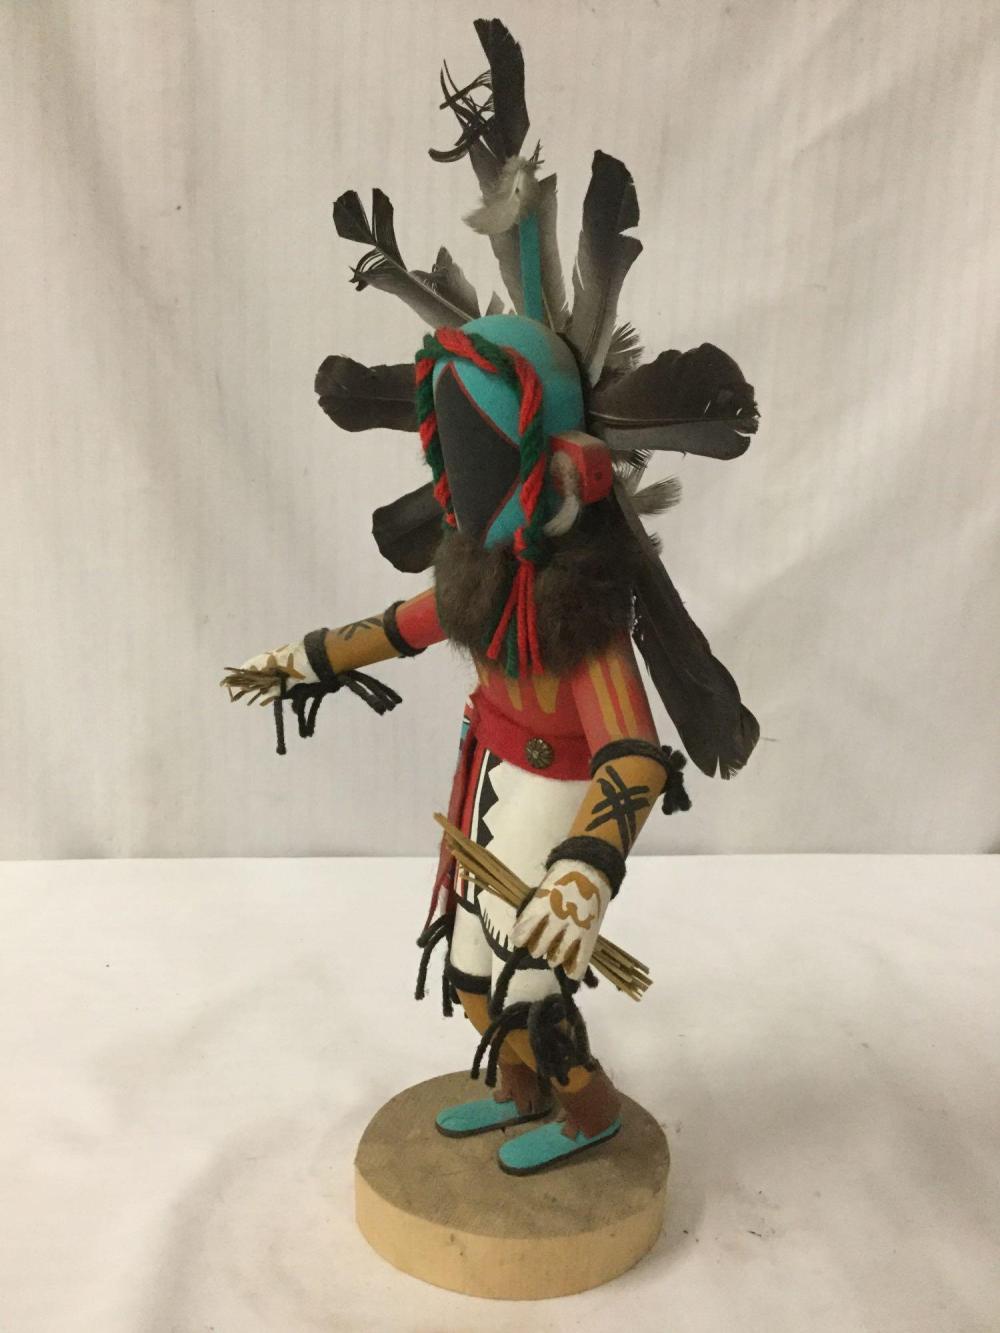 Lot 112: Native American art sculpture - Chasing Star - Hopi kachina doll, signed by artist J.F.T.